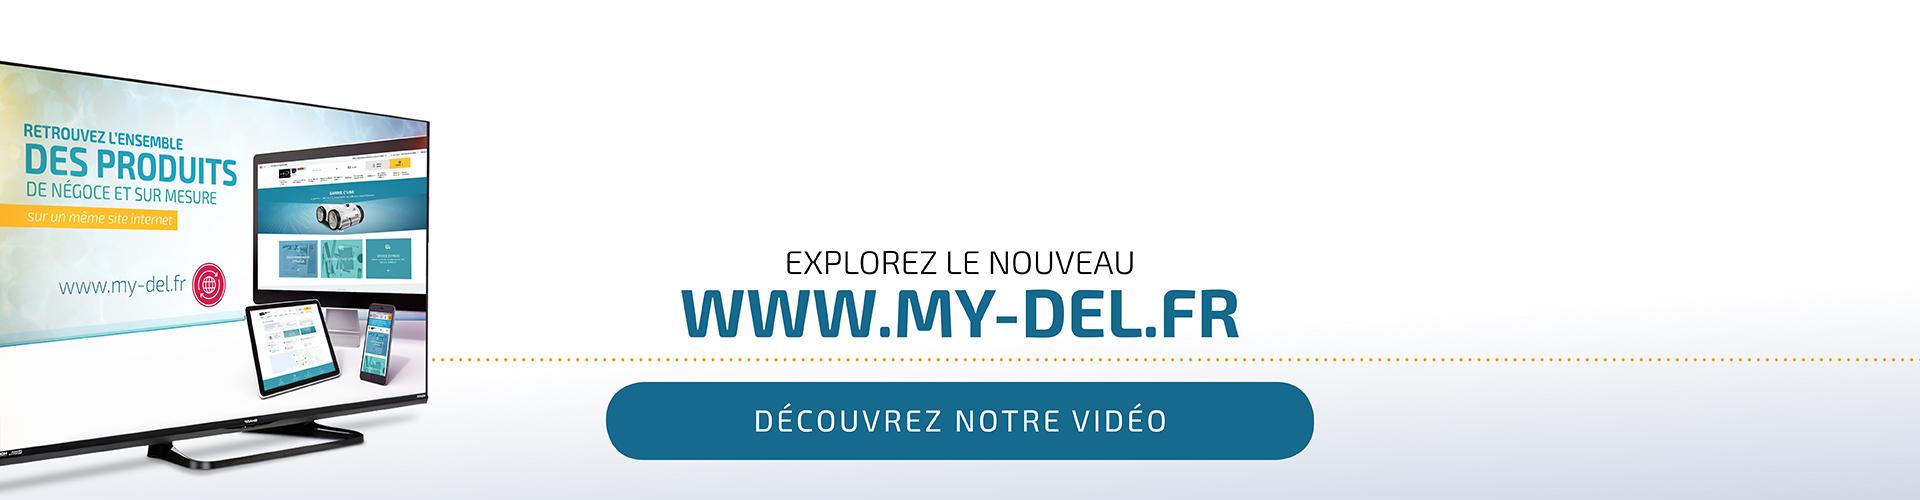 slider-presentation-site-2017-sans-en-tete